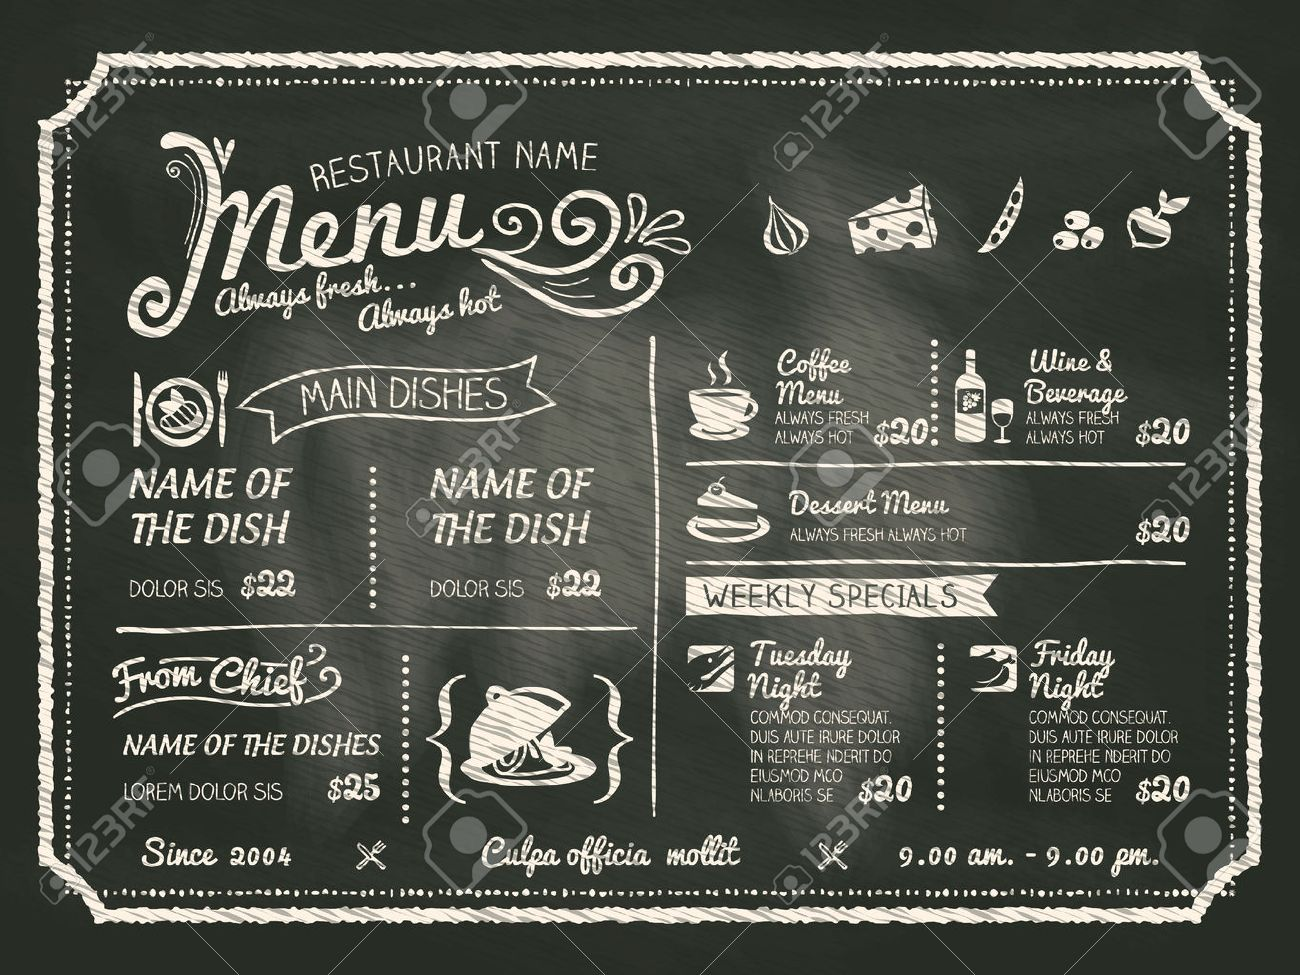 Restaurant Food Menu Design With Chalkboard Background Royalty ...